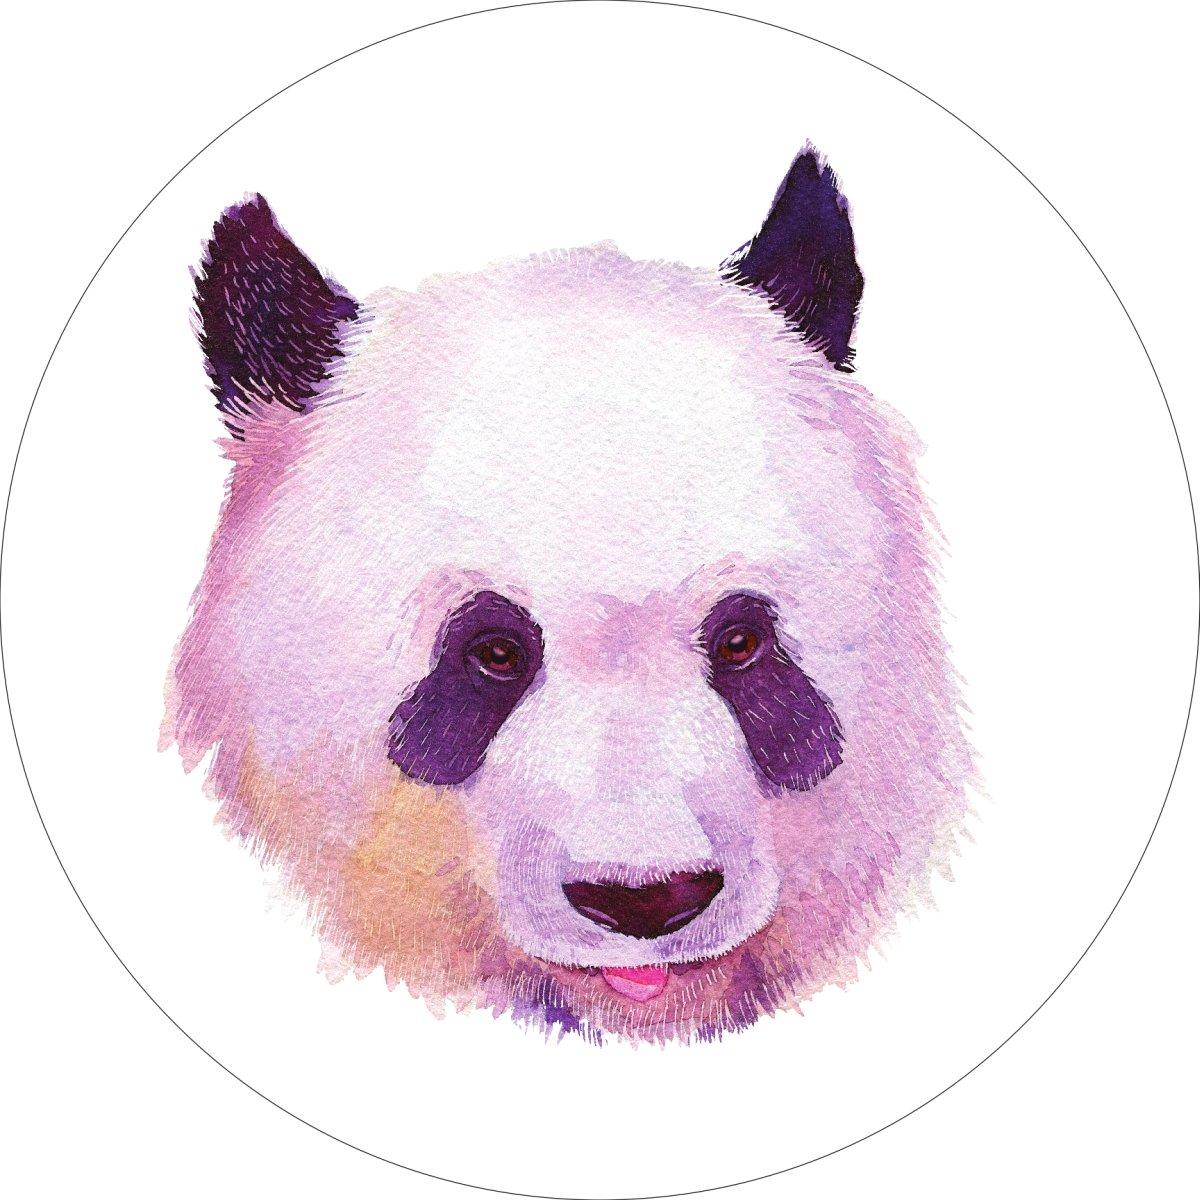 Panda Home Wall Shelf Decor Animal Decorations Watercolor Round Sign - 18 Inch, Metal